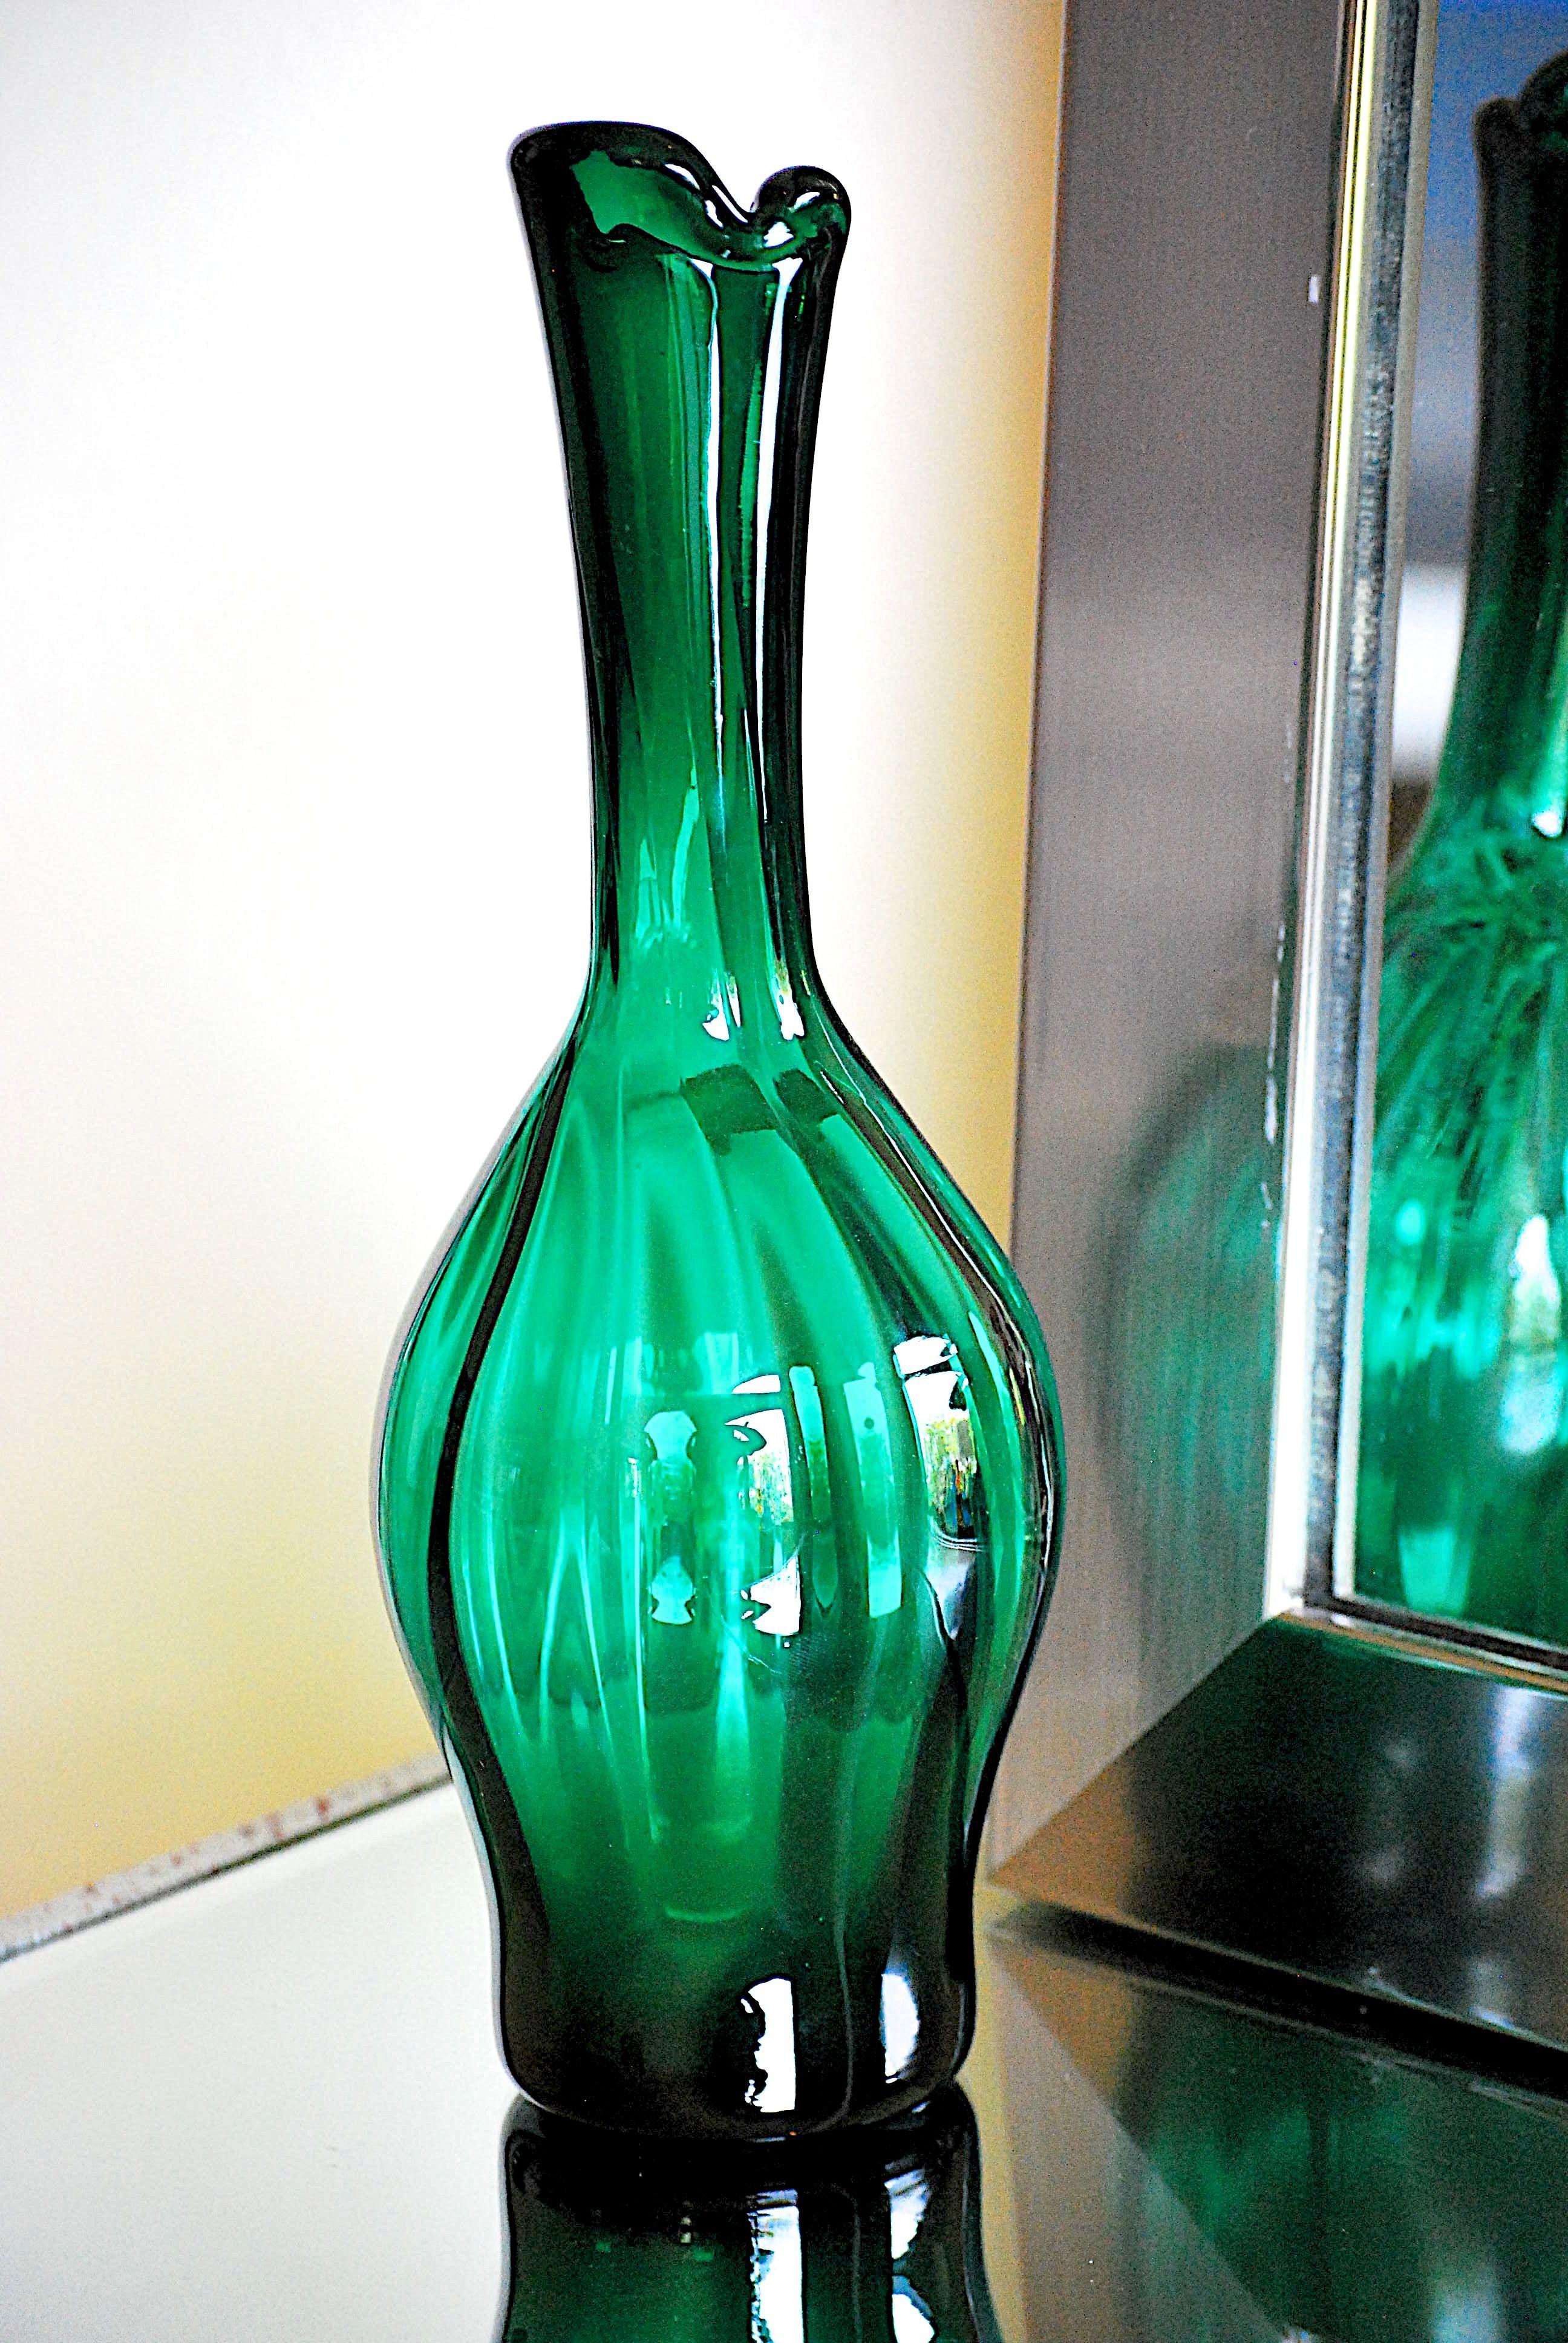 Vintage blenko hand blown glass vase designed by joel myers as vintage blenko hand blown glass vase designed by joel myers as seen in the 1964 catalog reviewsmspy